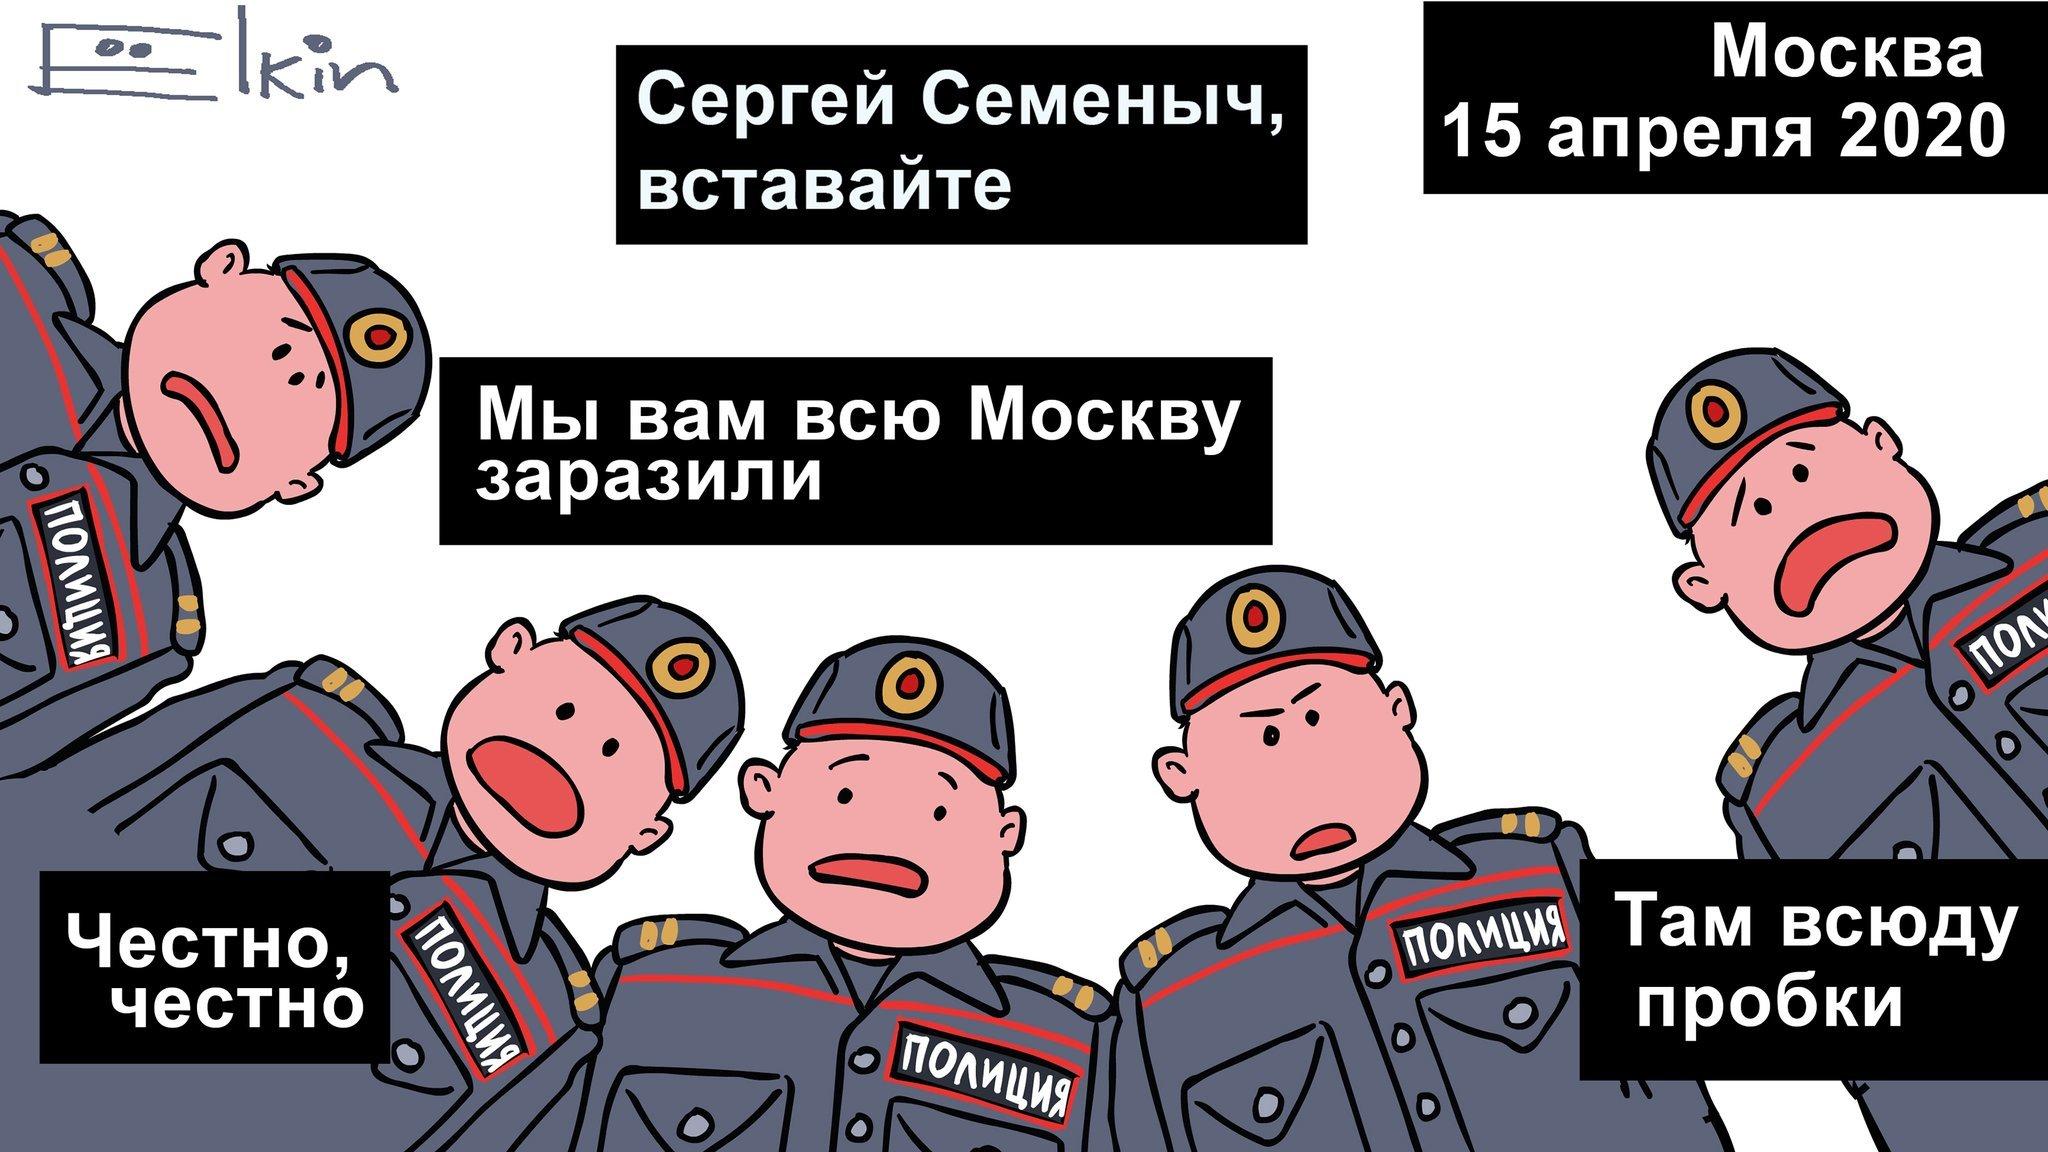 https://cs13.pikabu.ru/post_img/big/2020/04/16/6/1587029990146723075.jpg